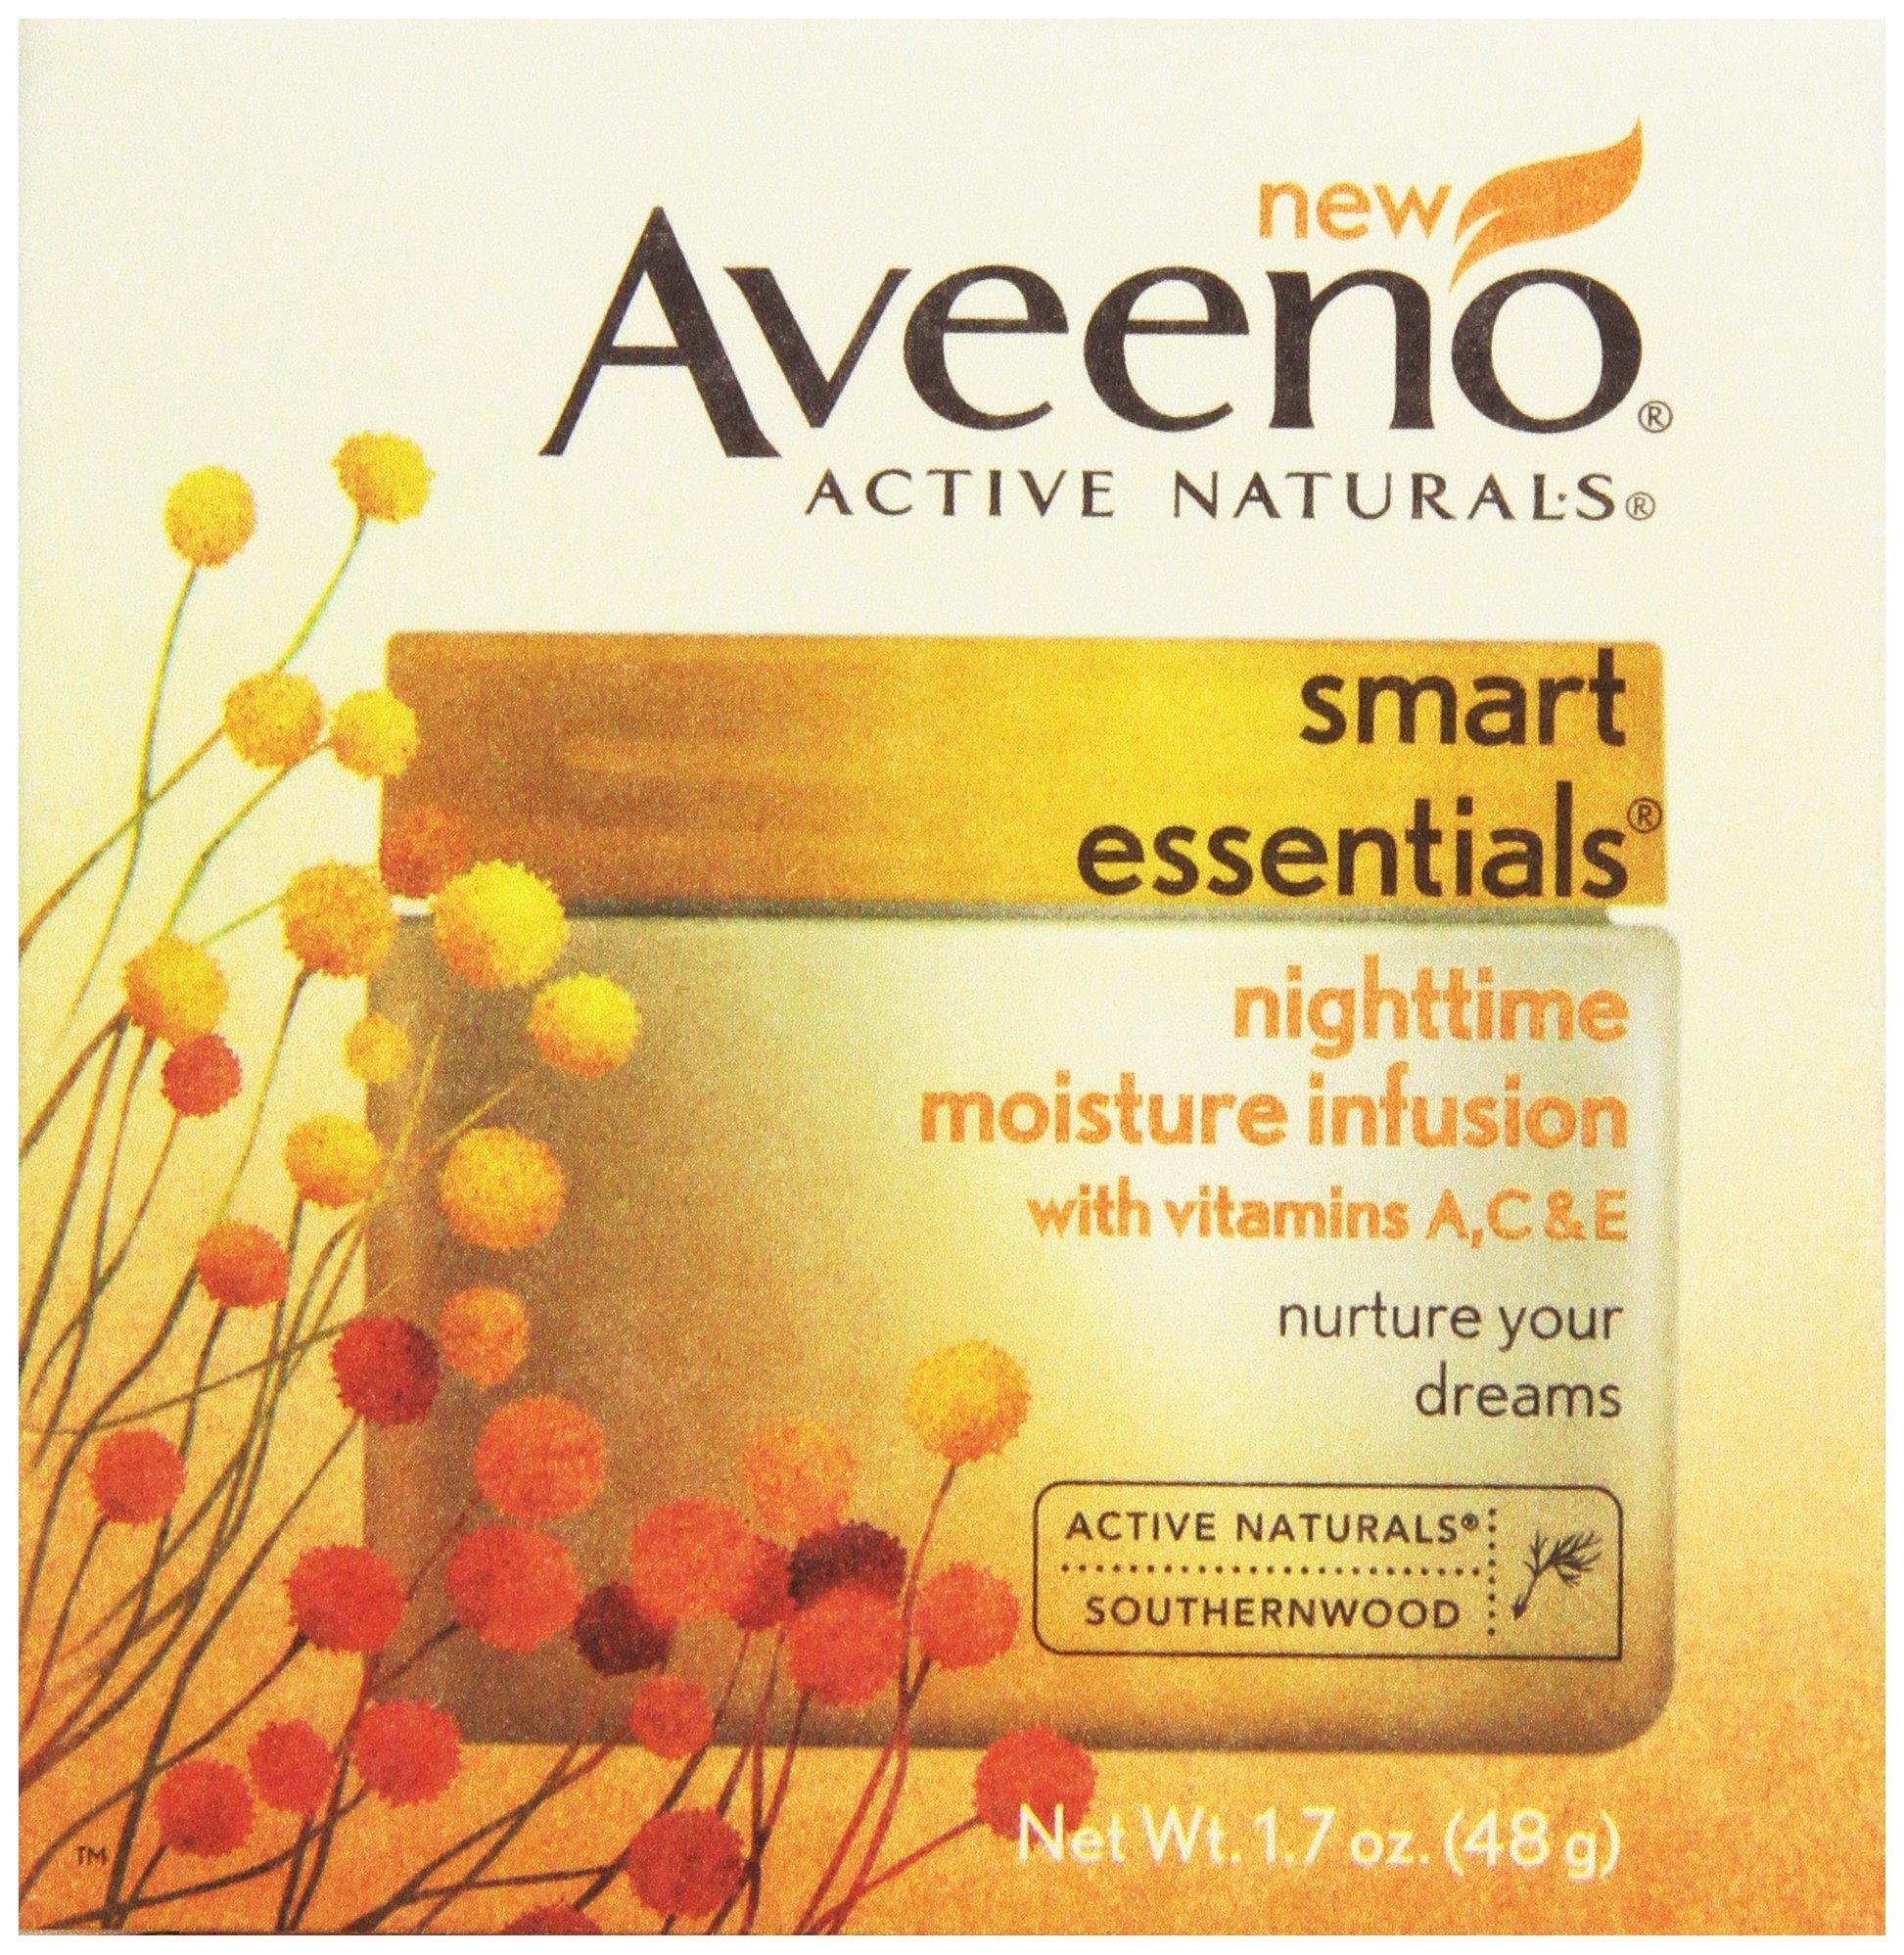 Aveeno, Facial Moisturizers Smart Essentials, Nighttime Moisture Infusion, 1.7 oz